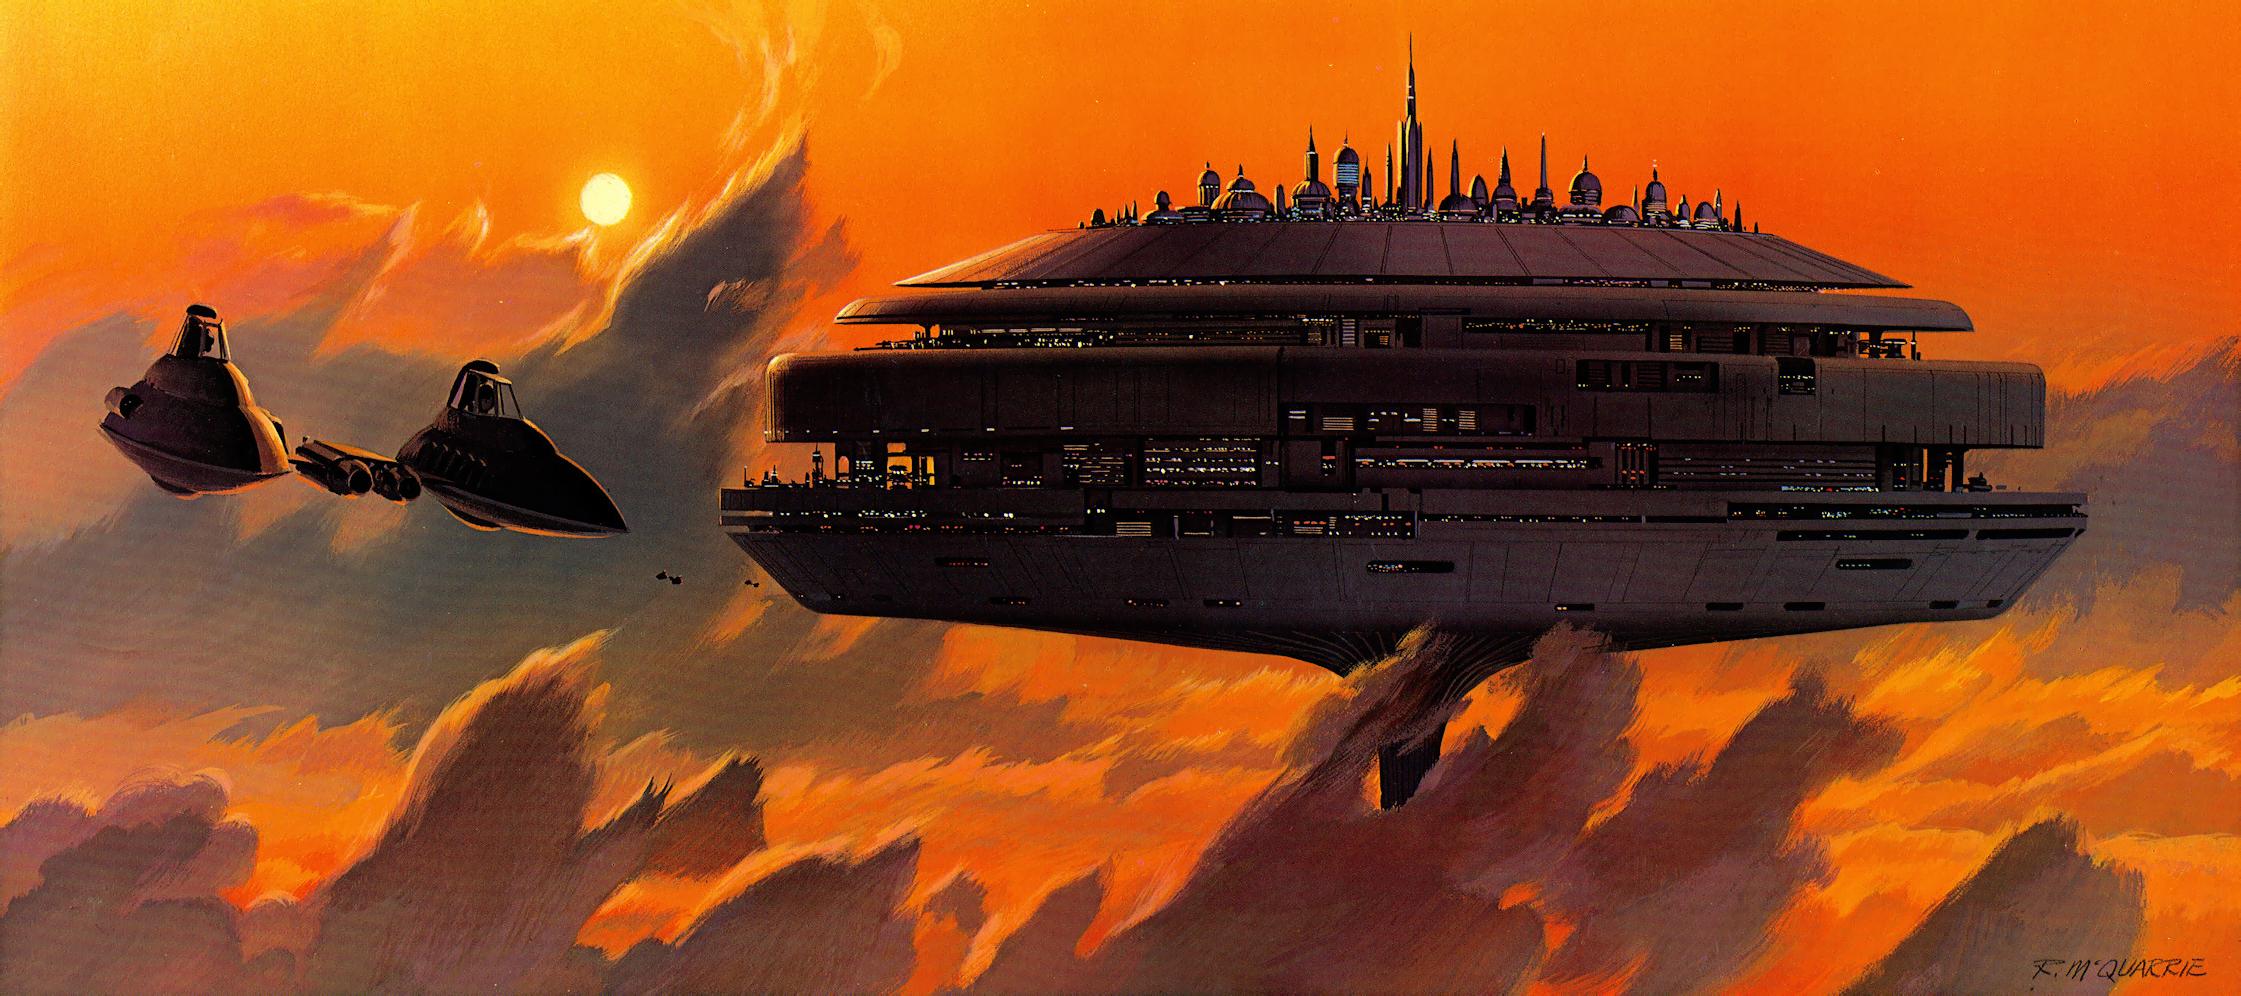 Cloud City - Wookieepedia, the Star Wars Wiki